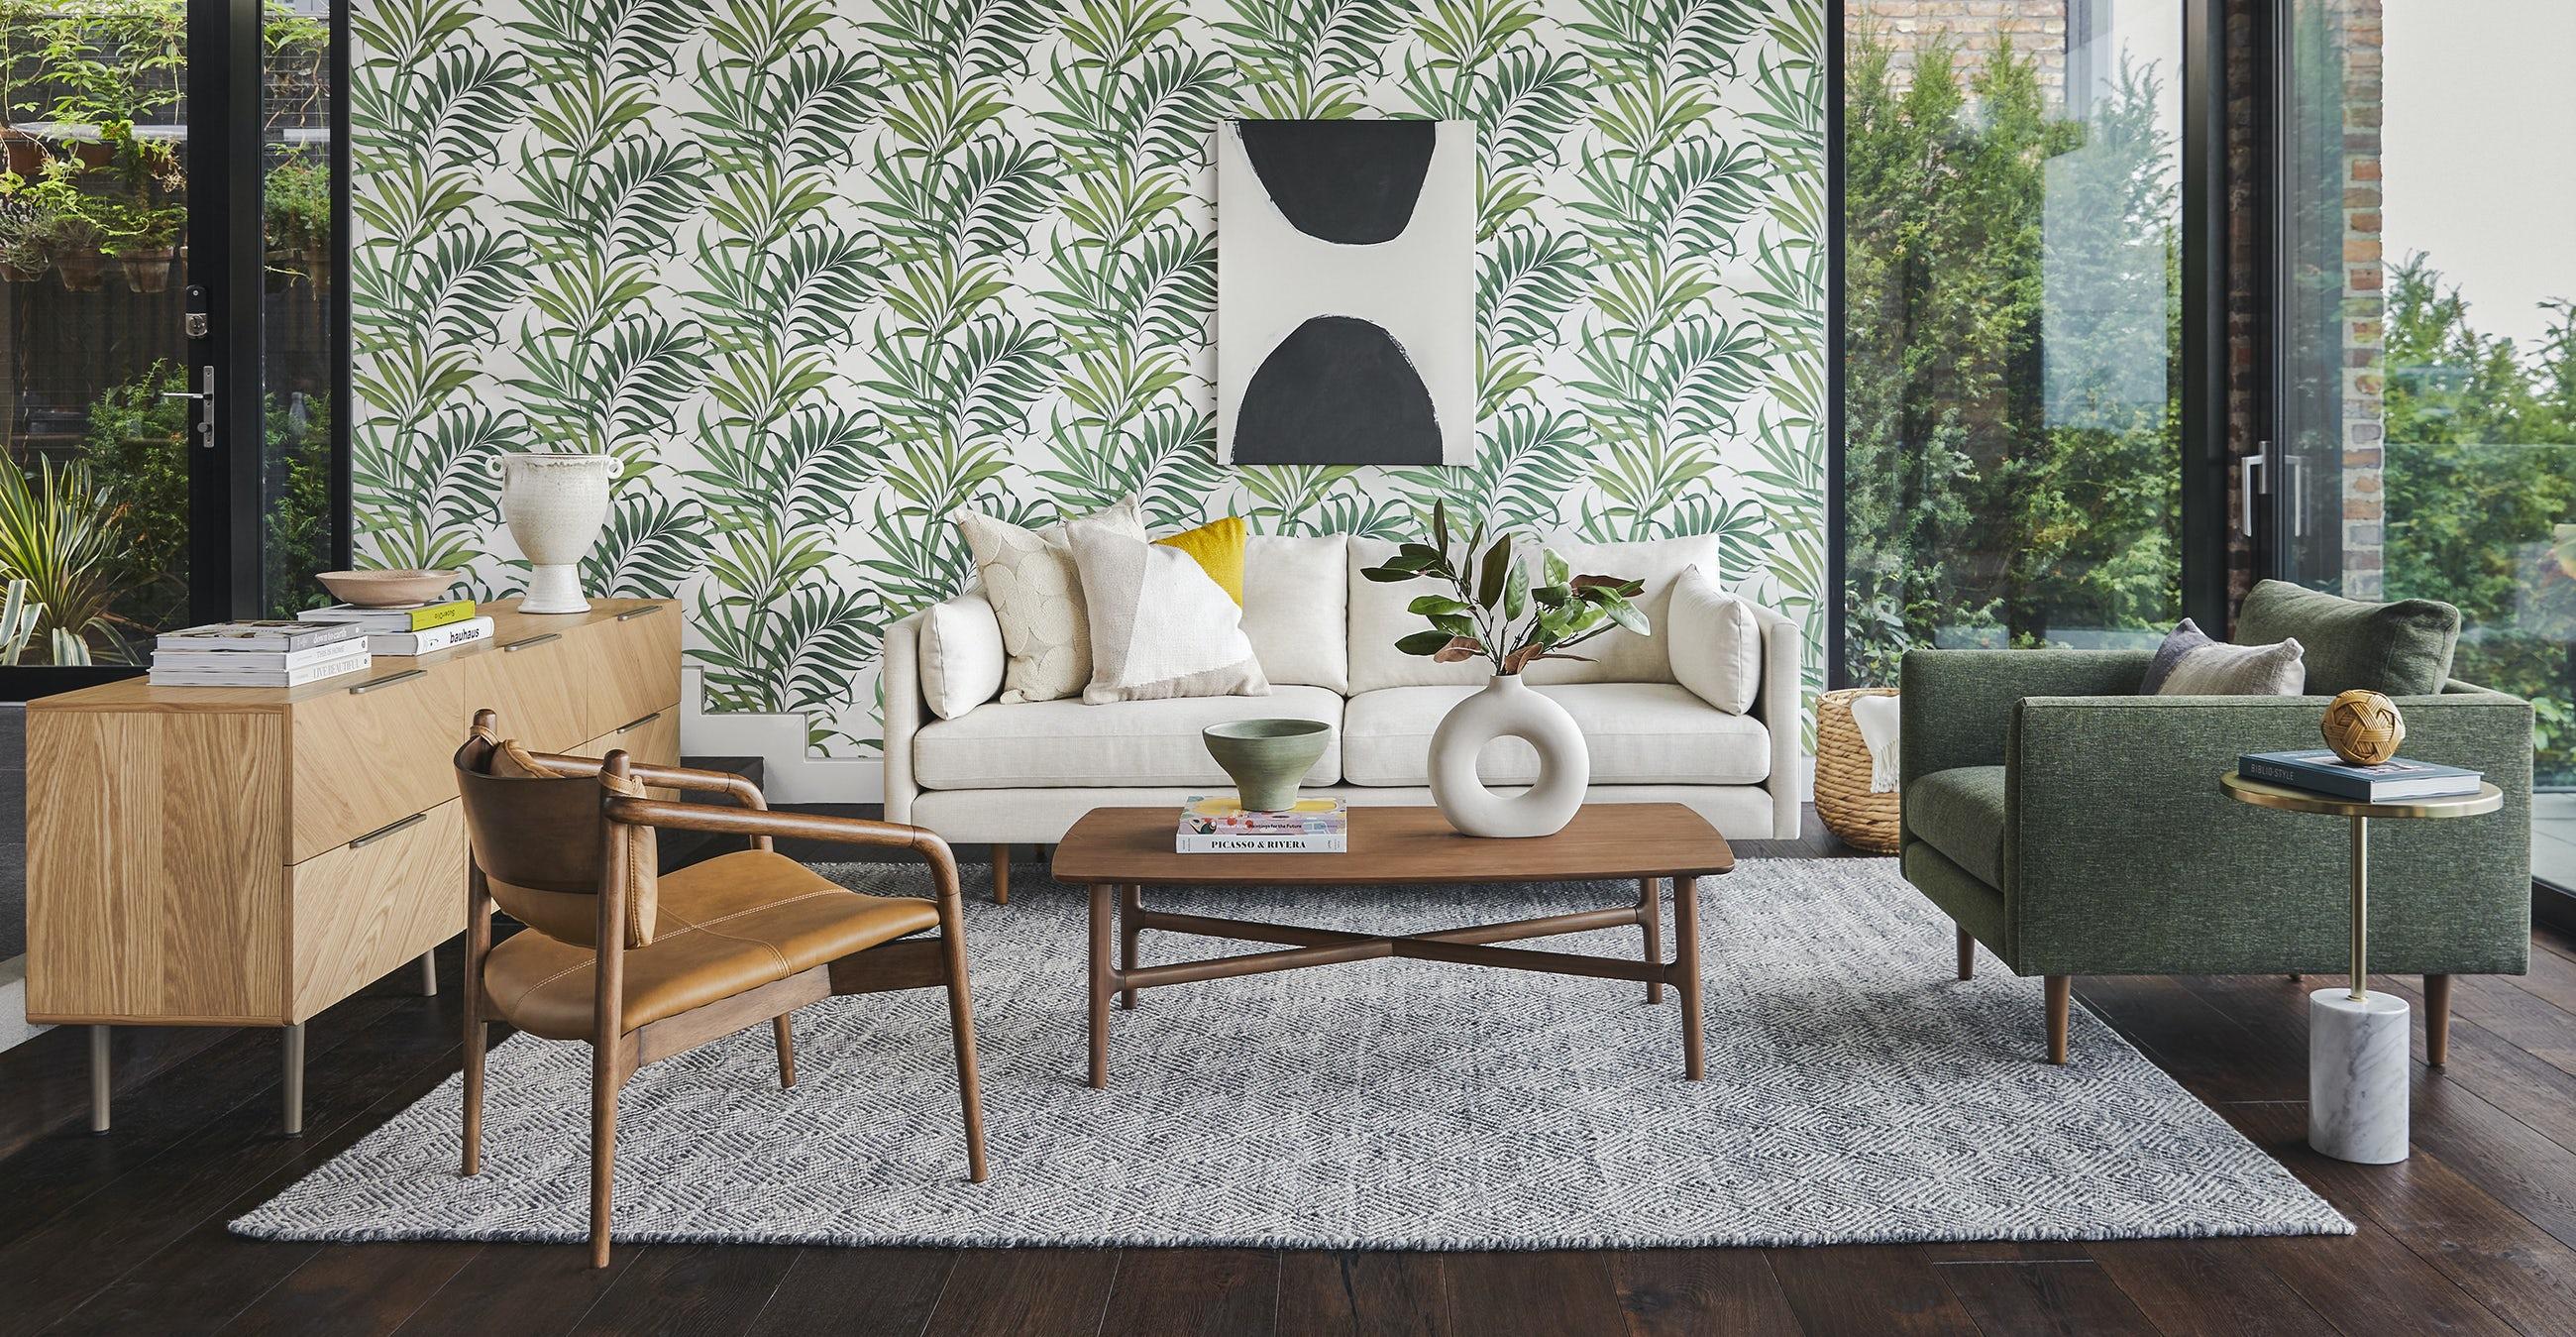 Burrard Forest Green Chair